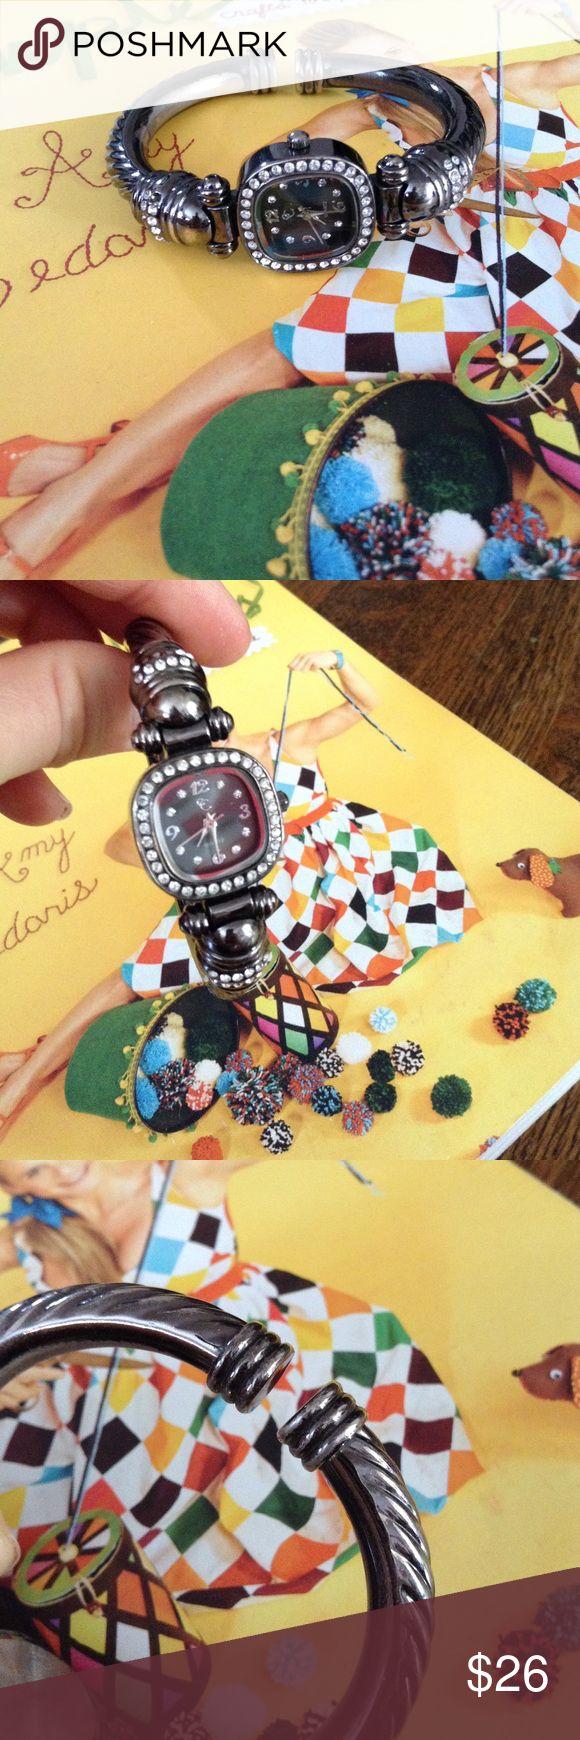 Sparkling dark steel colored watch Fun, sparkly women's watch in great condition! 💎💎 Accessories Watches